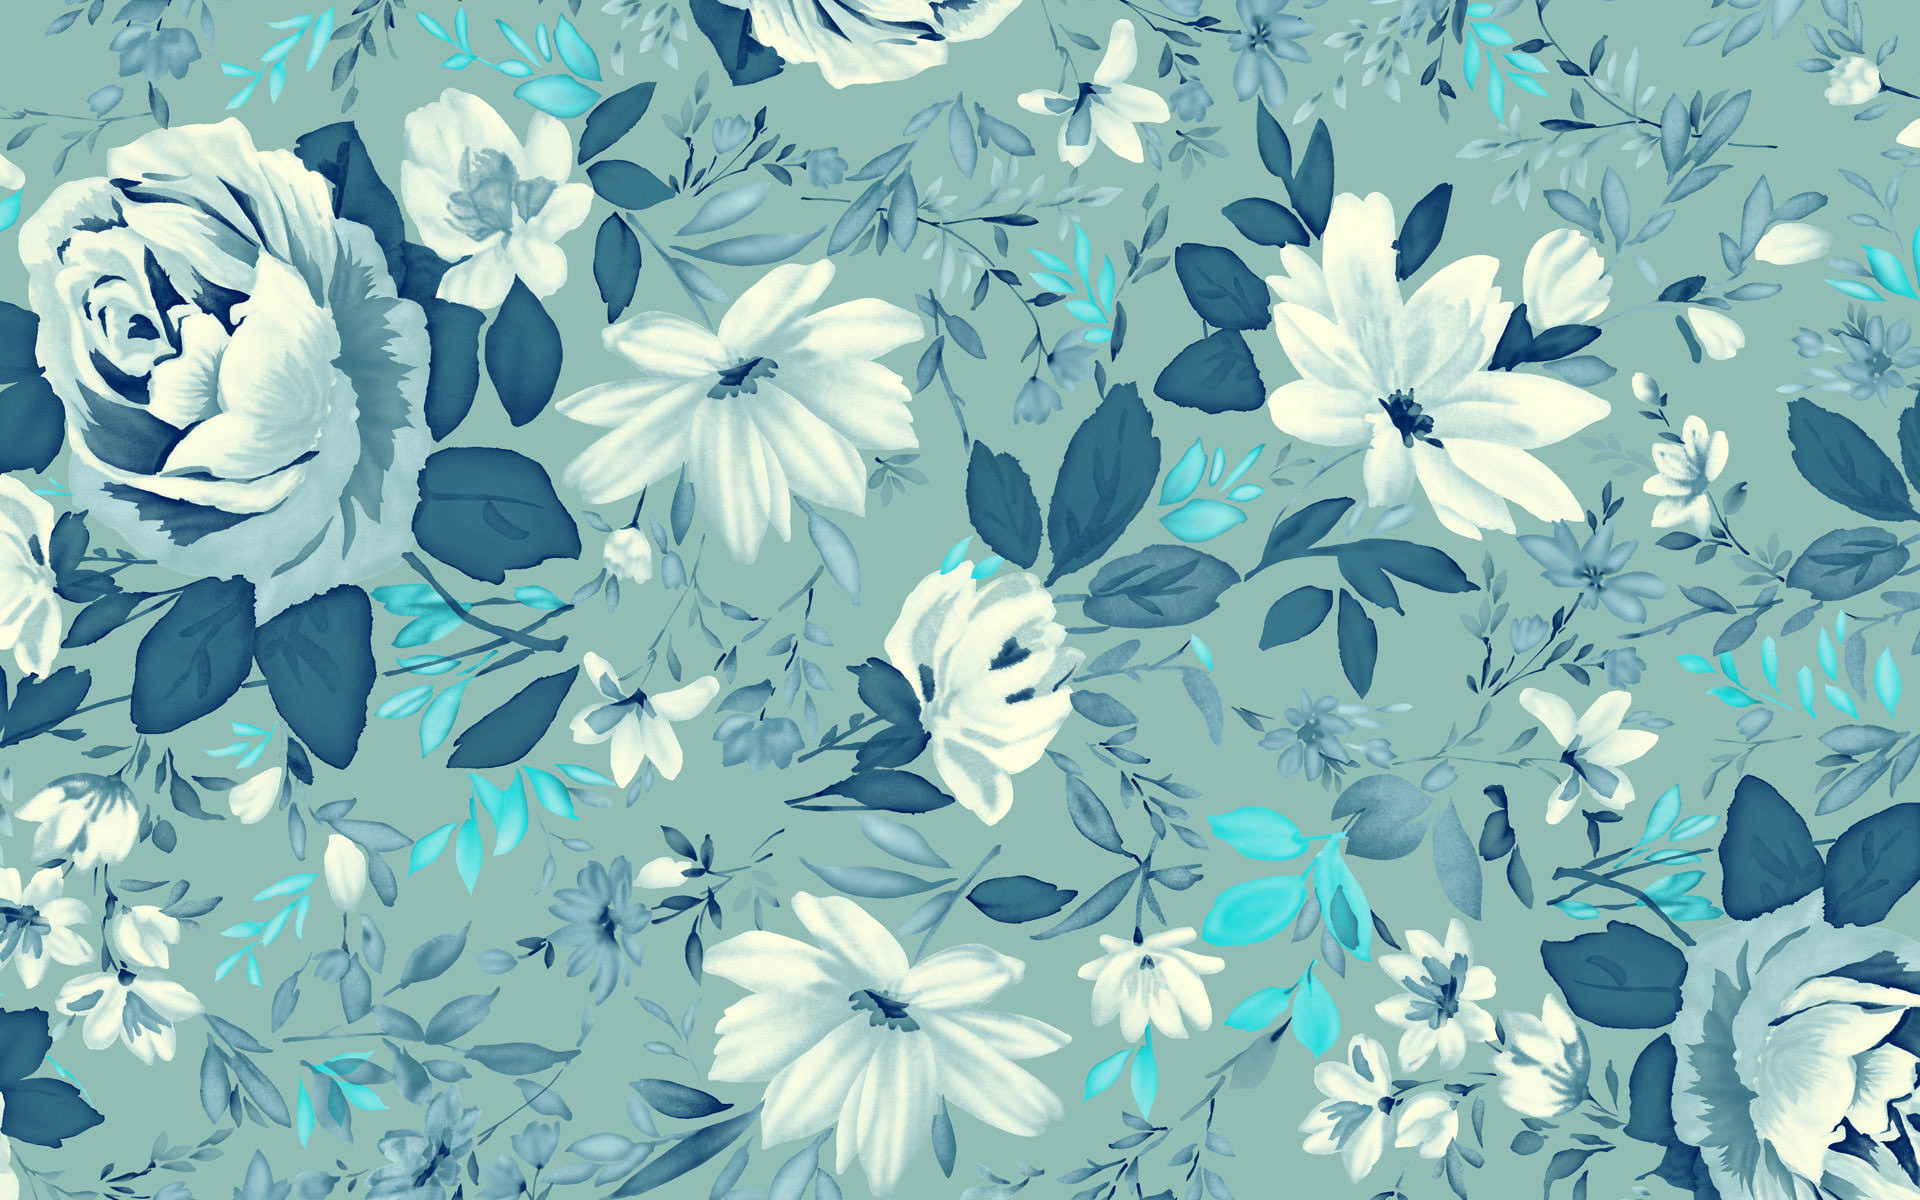 Flower Wallpaper Tumblr, Flower Wallpaper Hd, Roses,retro, - Flowers Wallpaper Vintage Blue , HD Wallpaper & Backgrounds